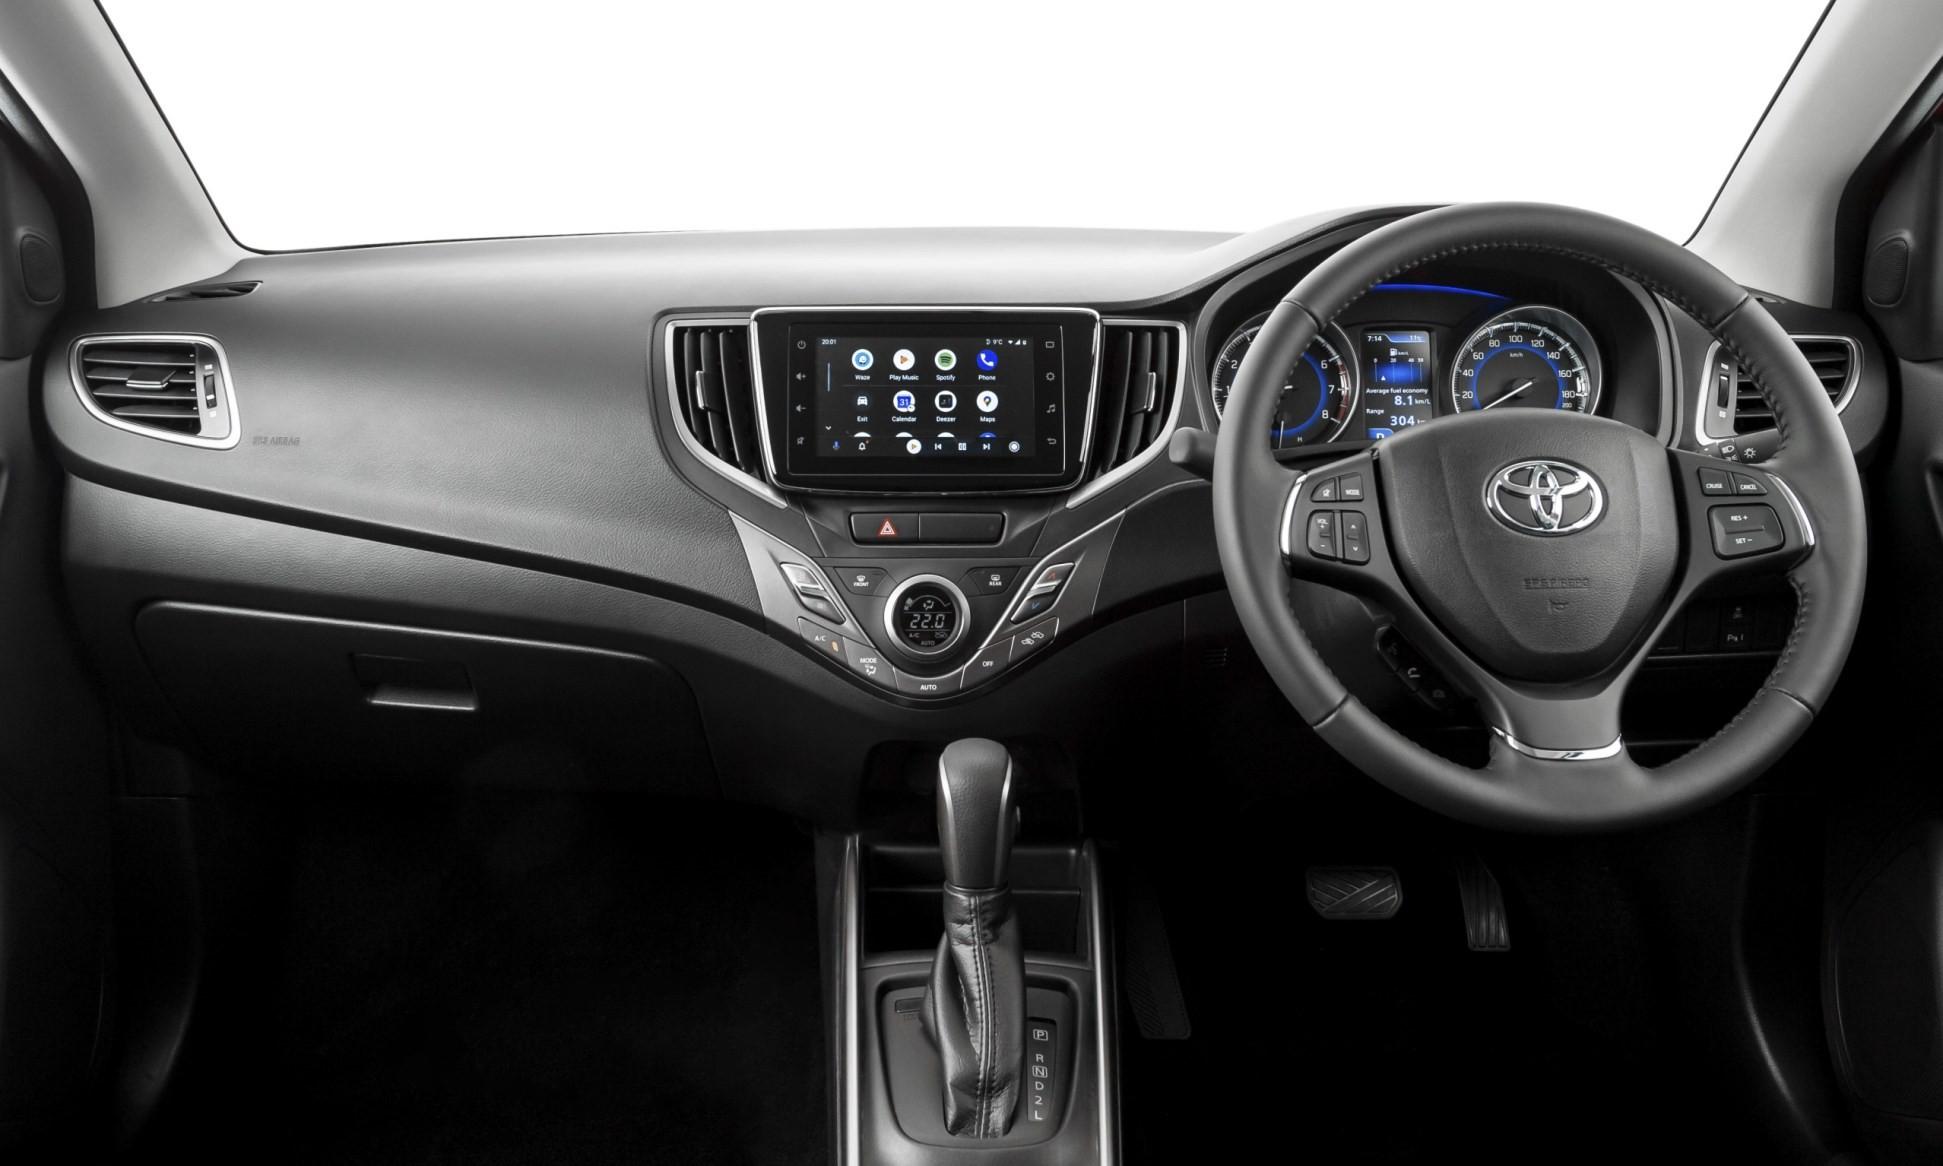 Toyota Starlet interior